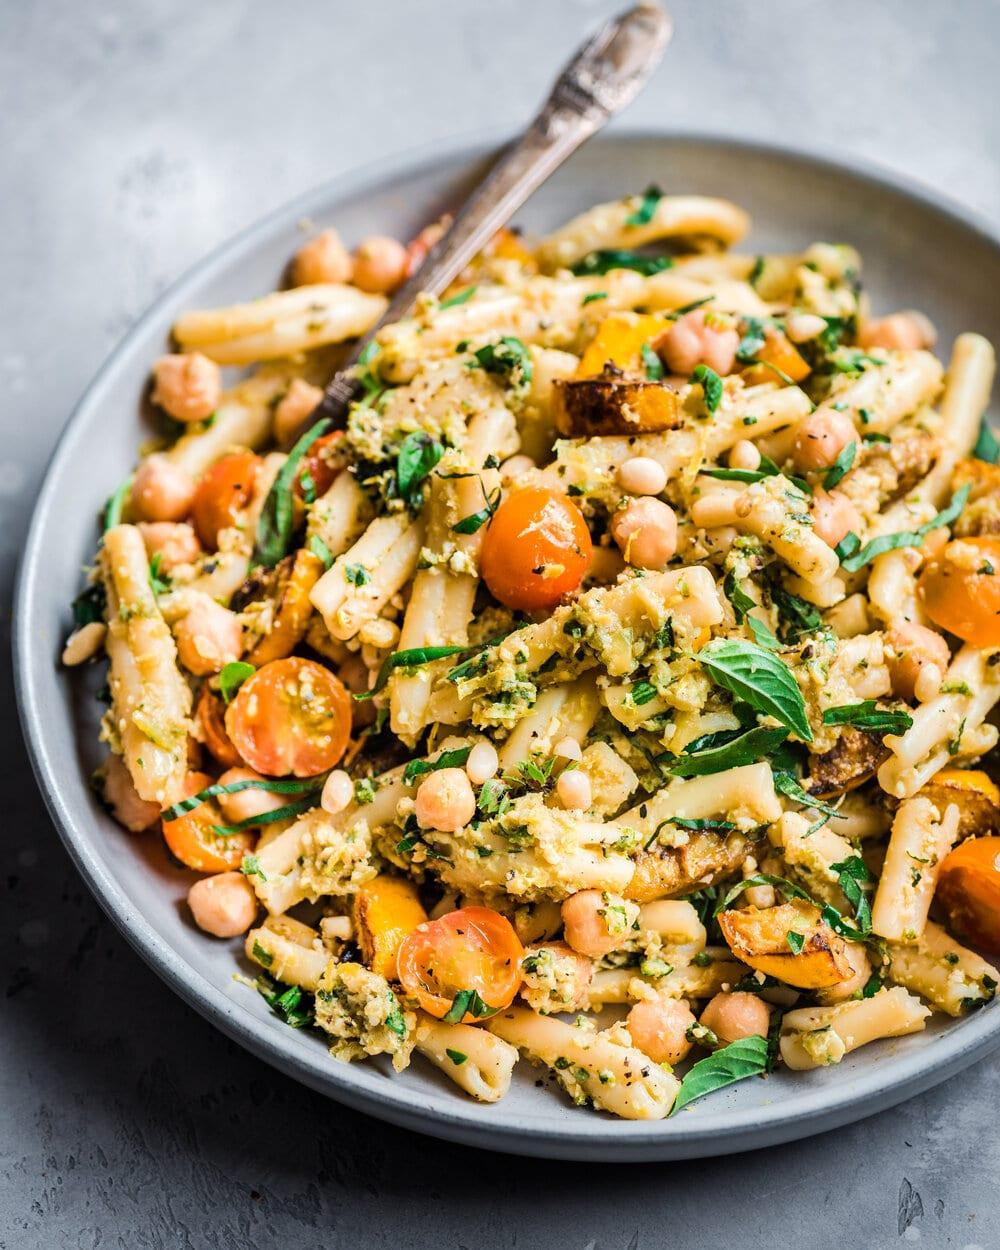 Creamy Vegan Zucchini Pesto Pasta